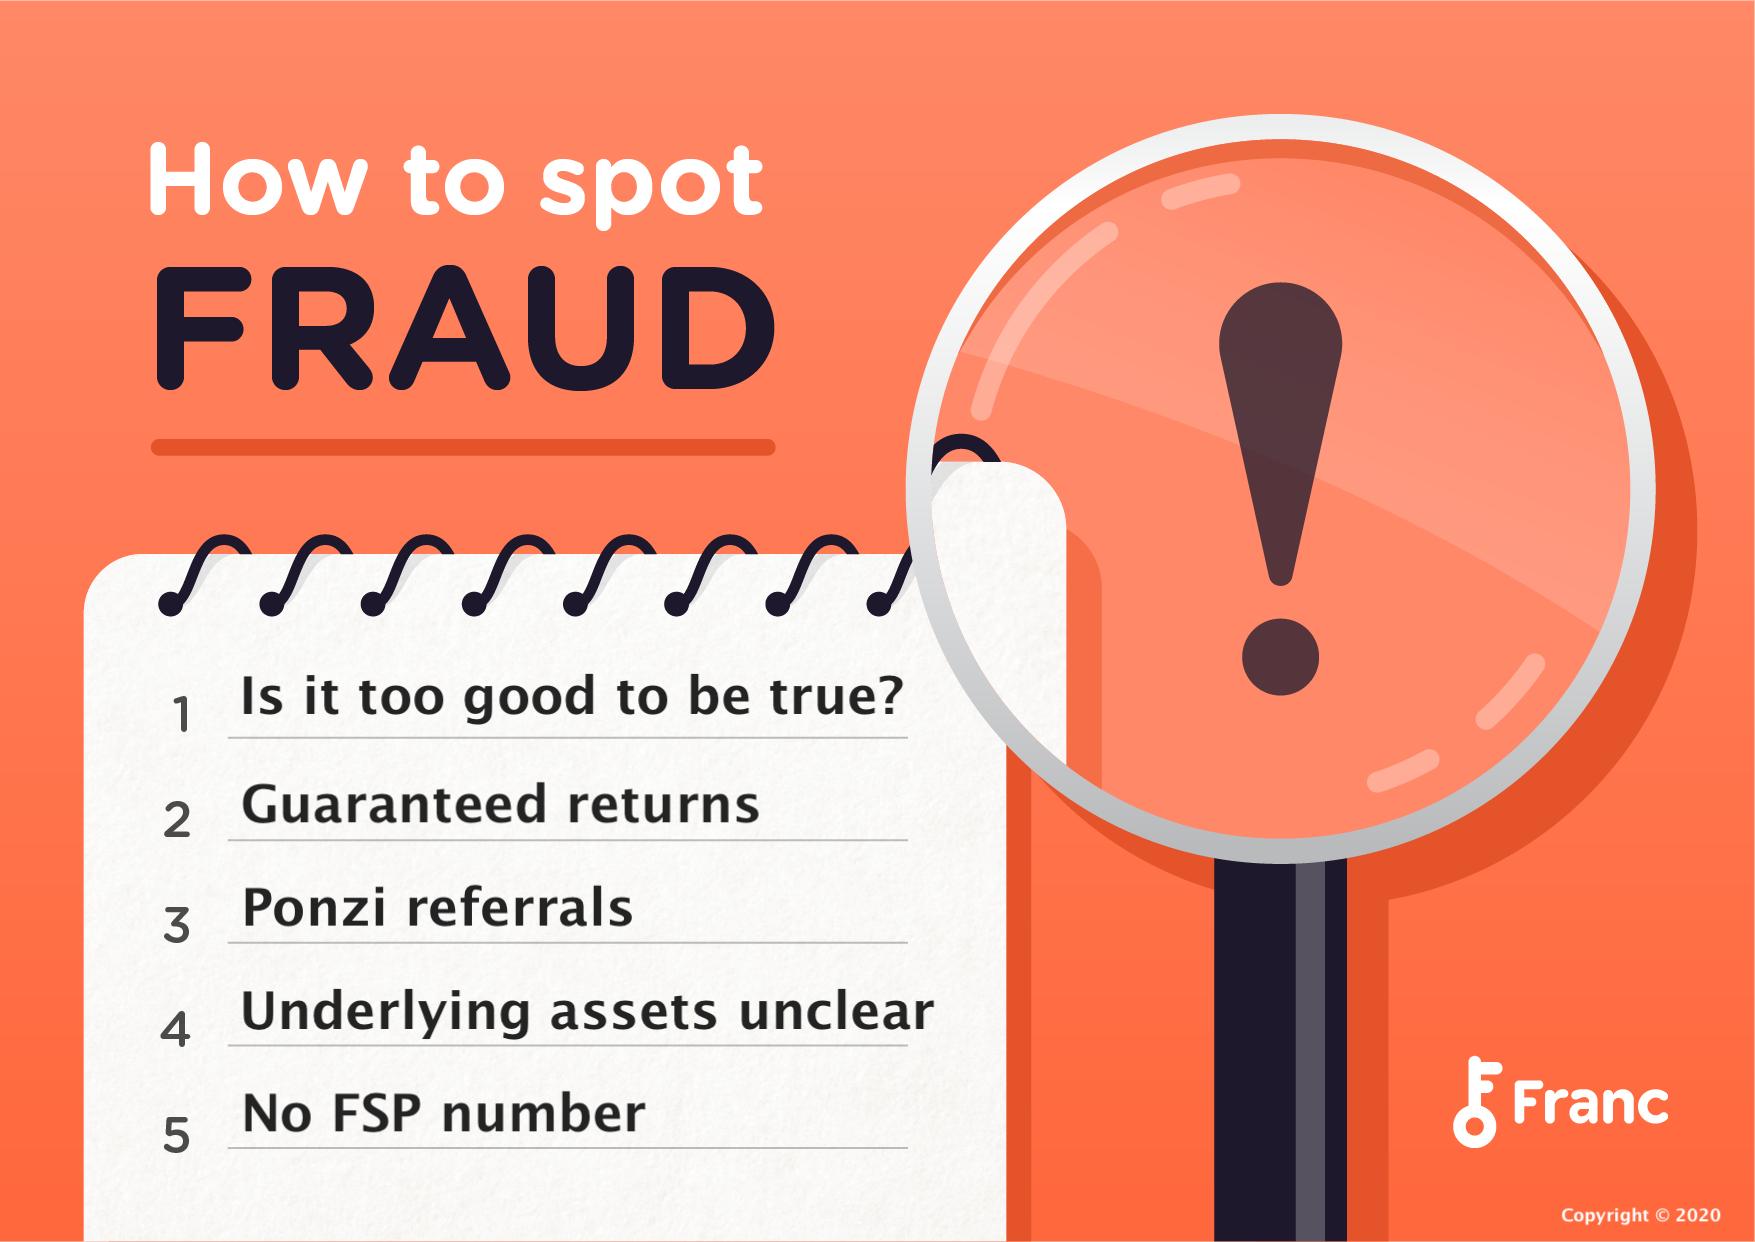 Checklist for fraud detection franc.app